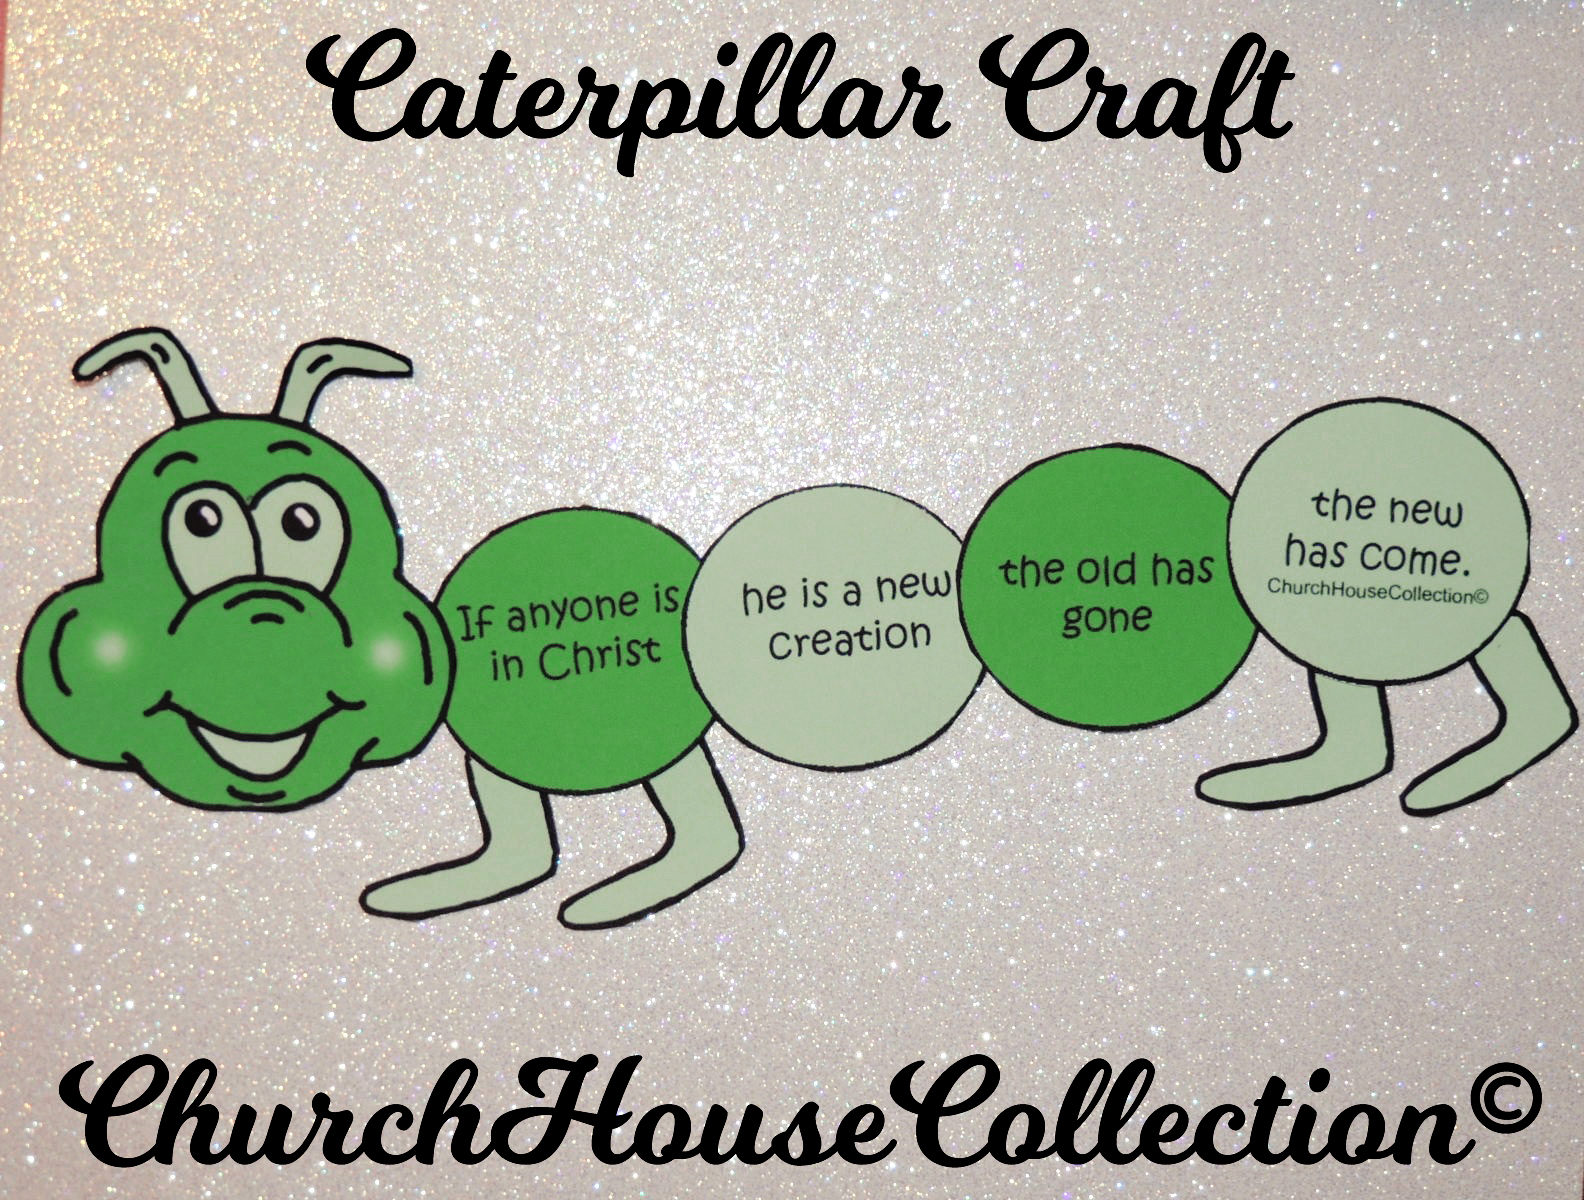 Church House Collection Blog